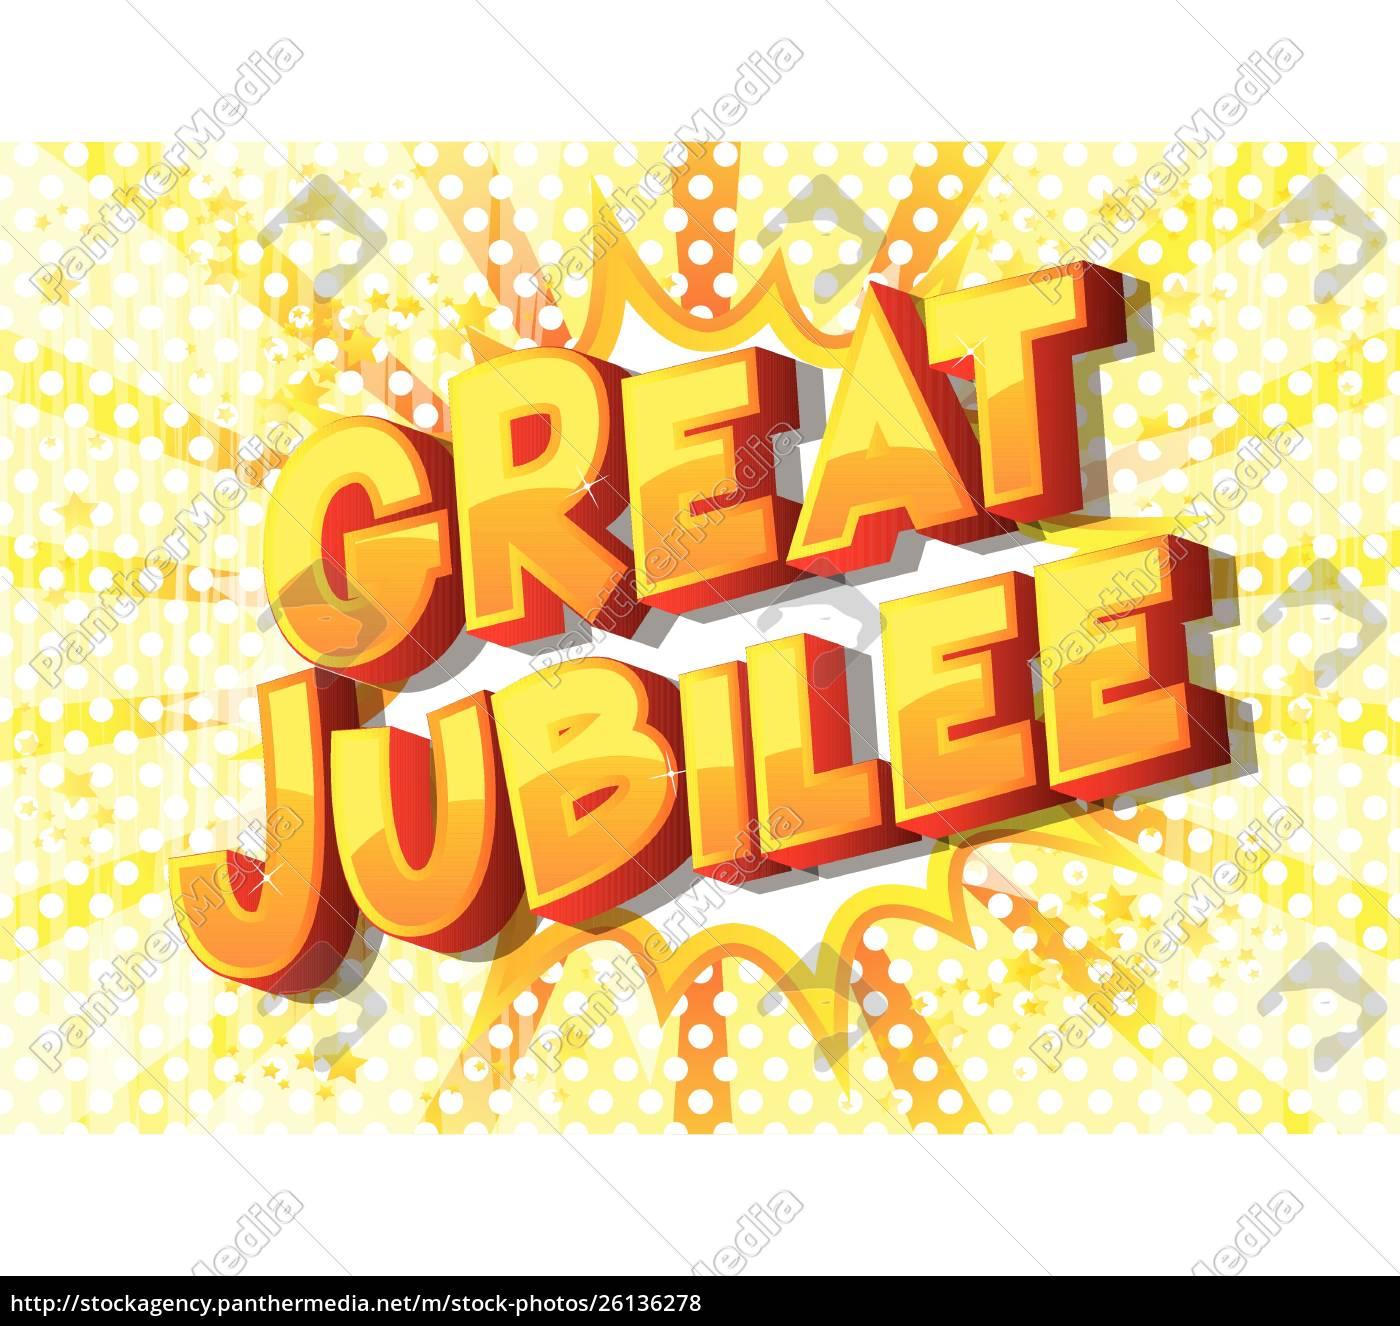 great, jubilee, -, comic, book, style - 26136278